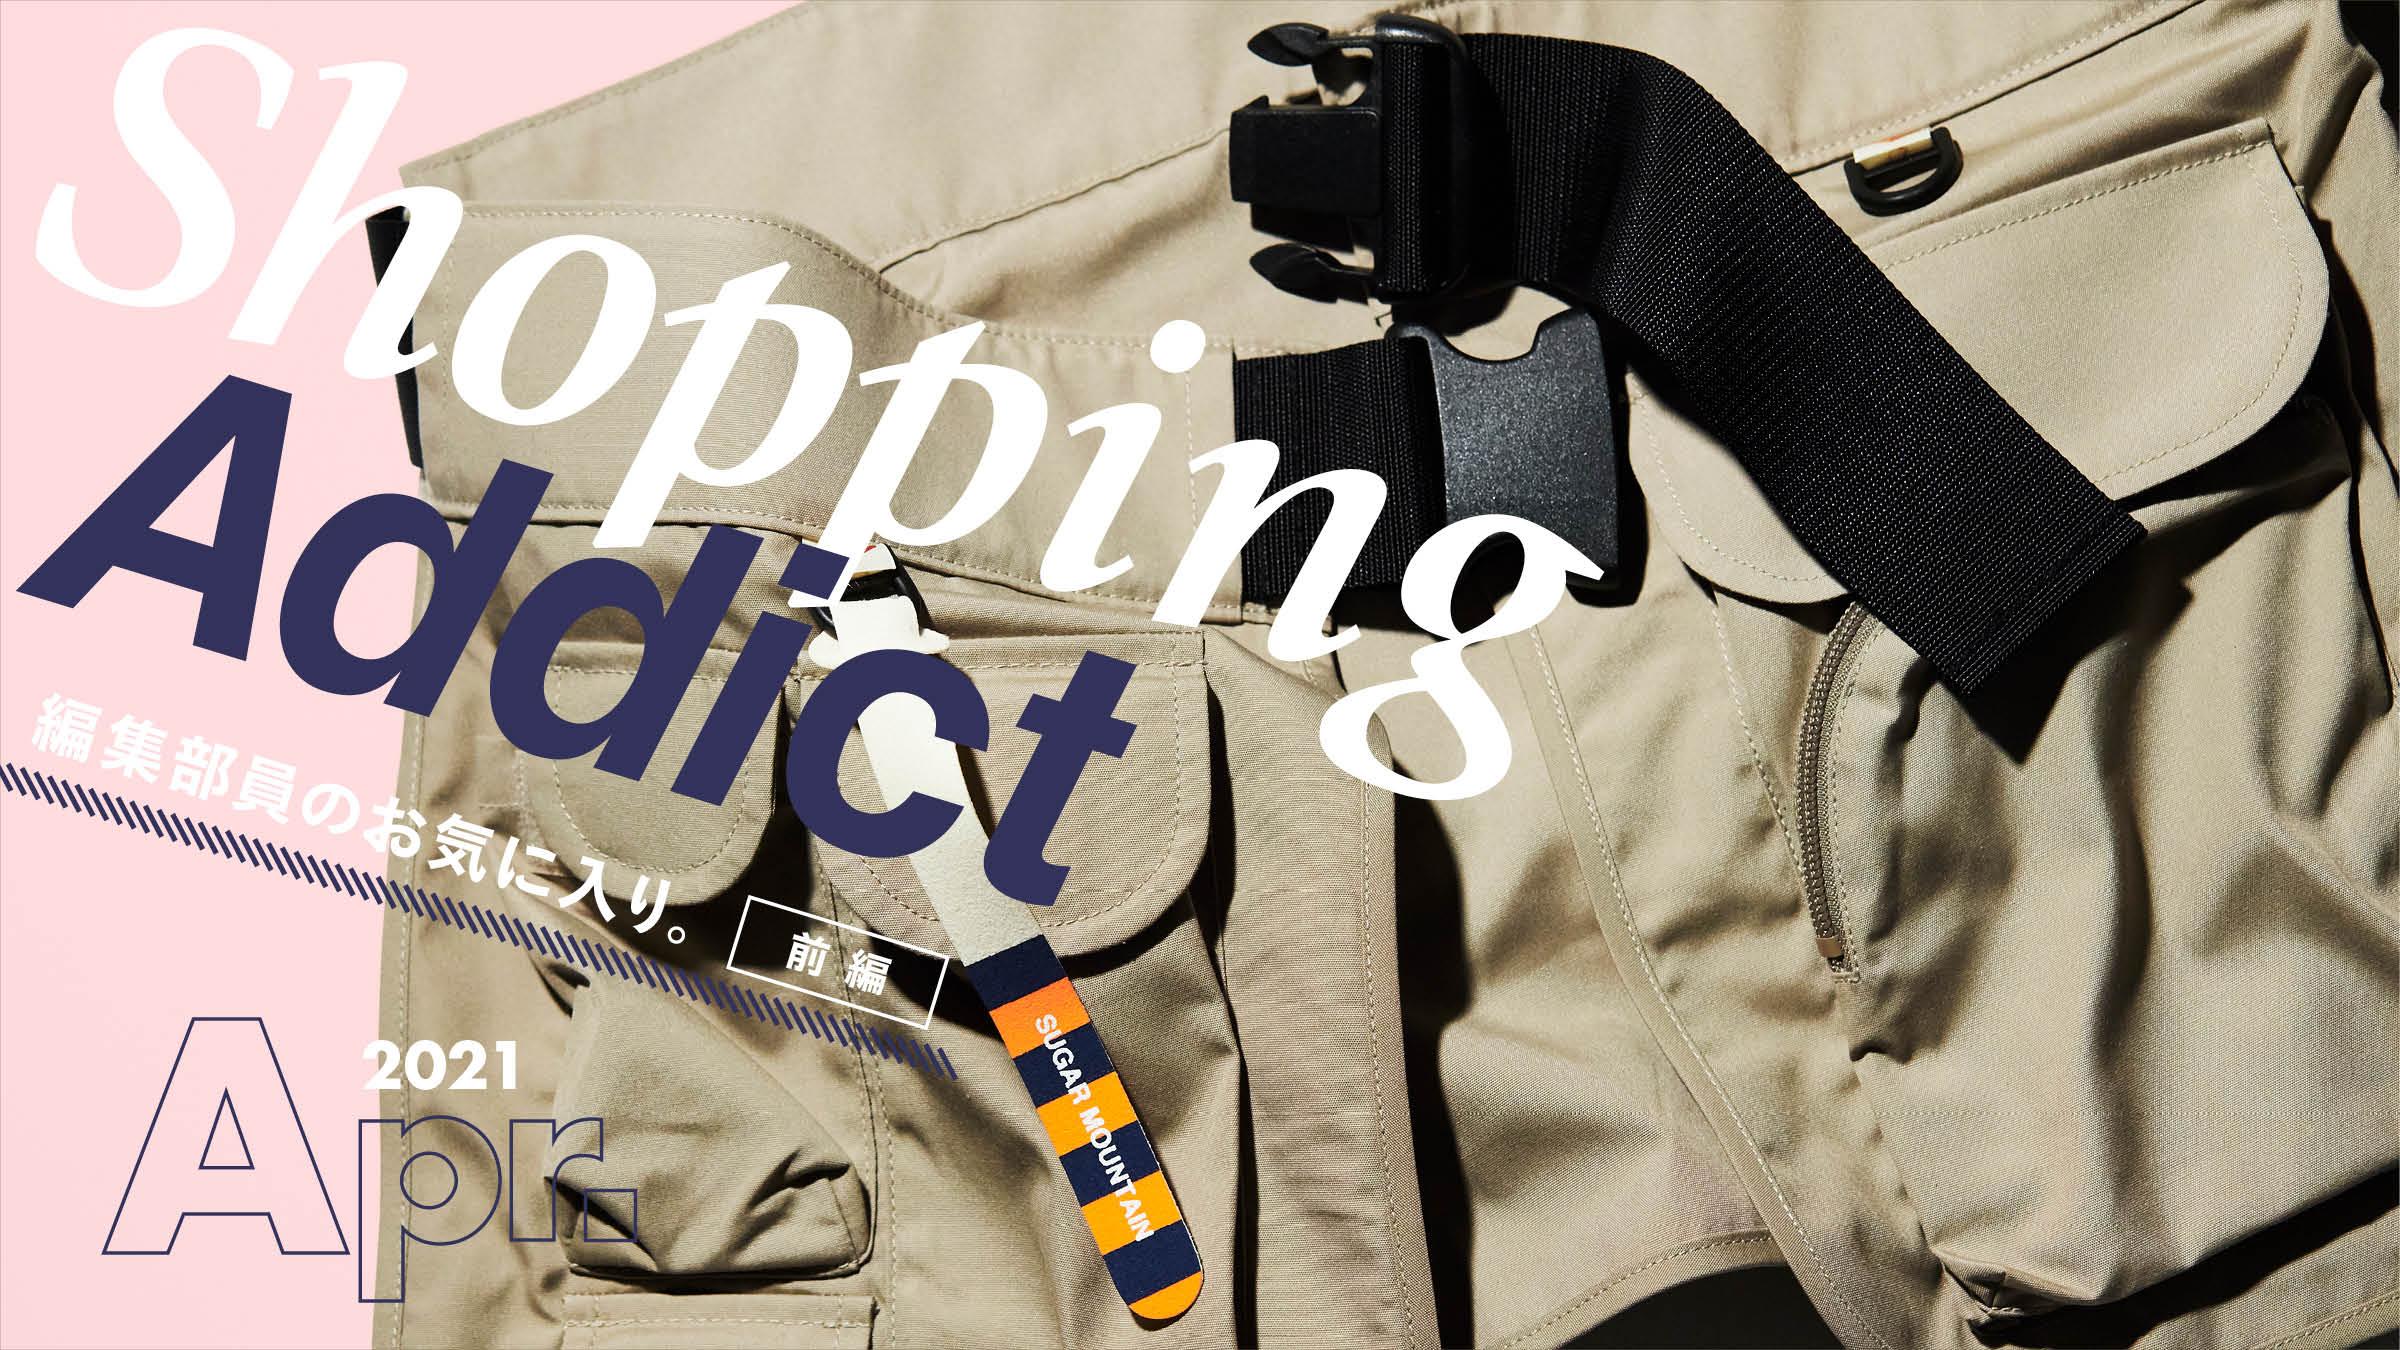 Shopping Addict 2021 Apr. 〜編集部員のお気に入り〜 前編